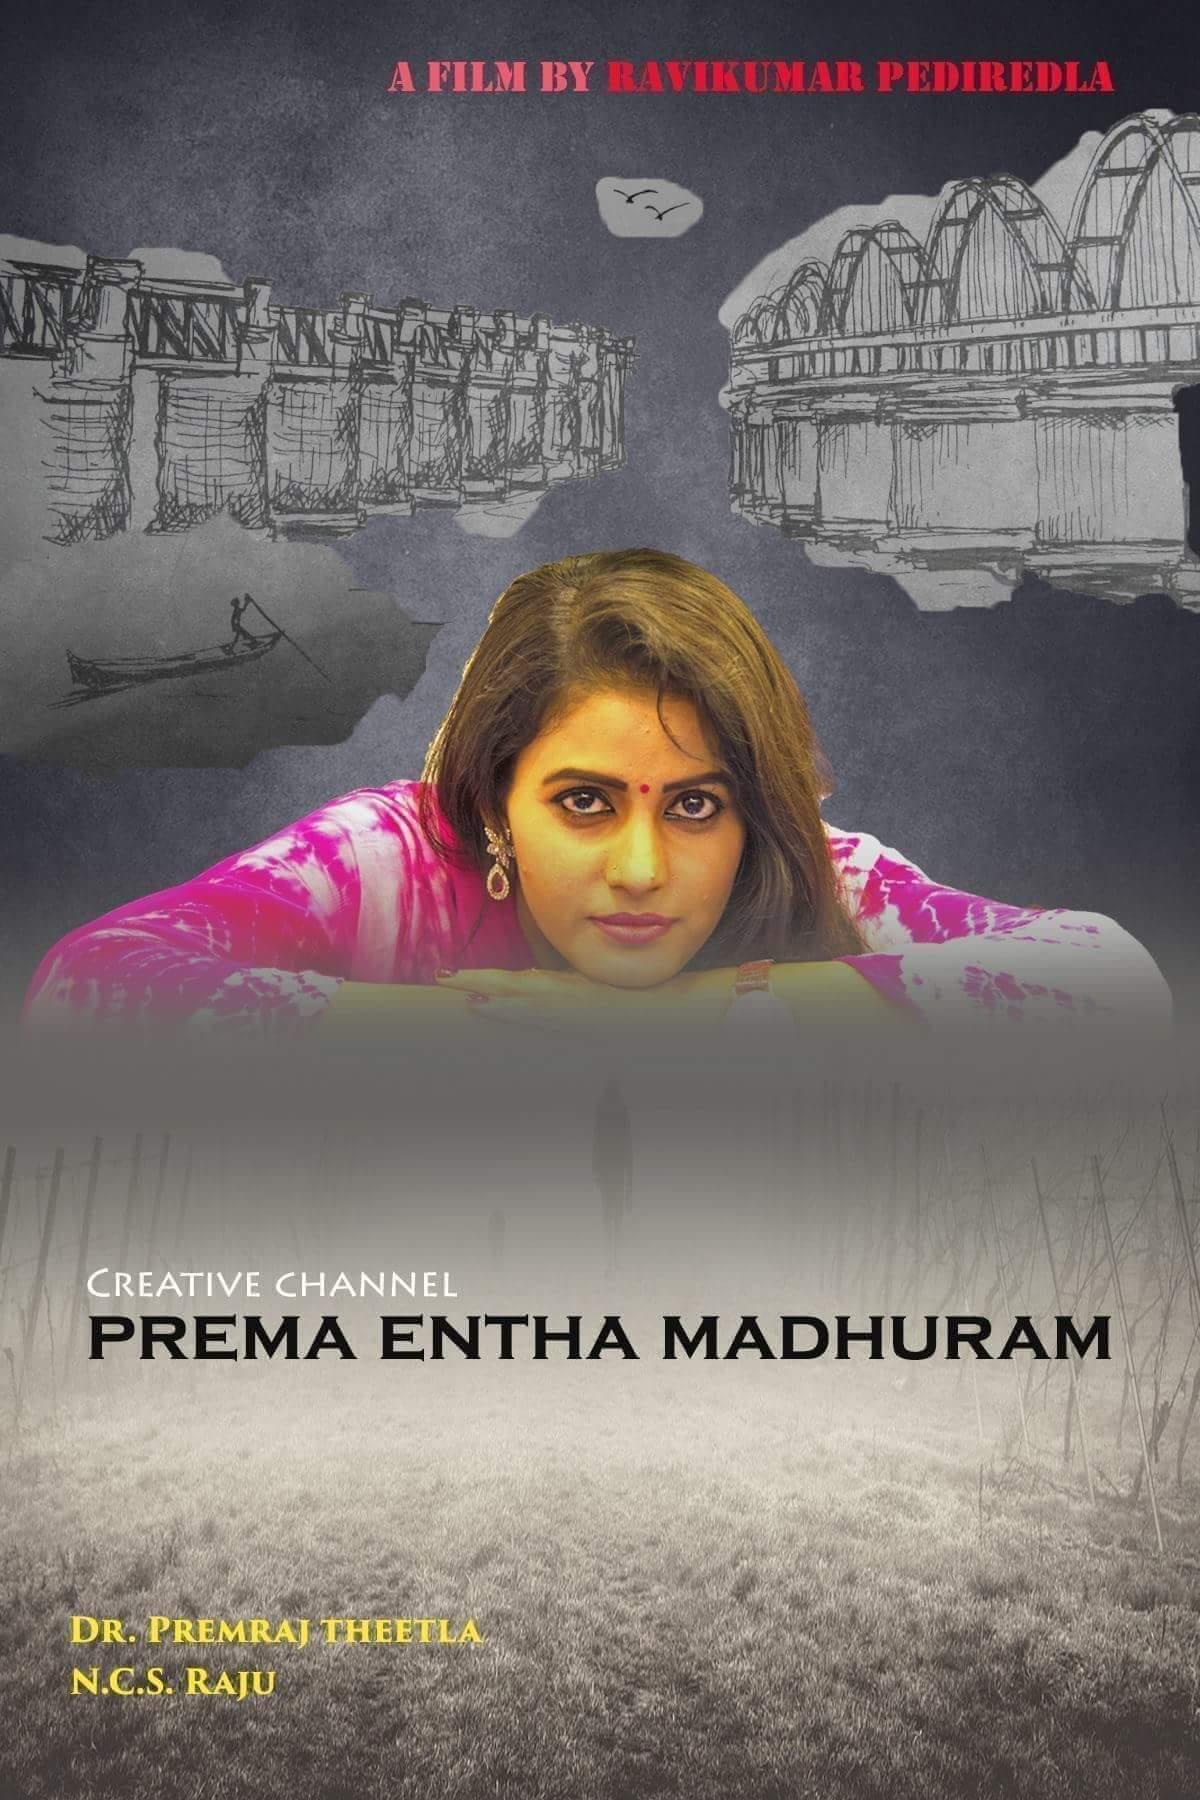 Prema Entha Madhuram